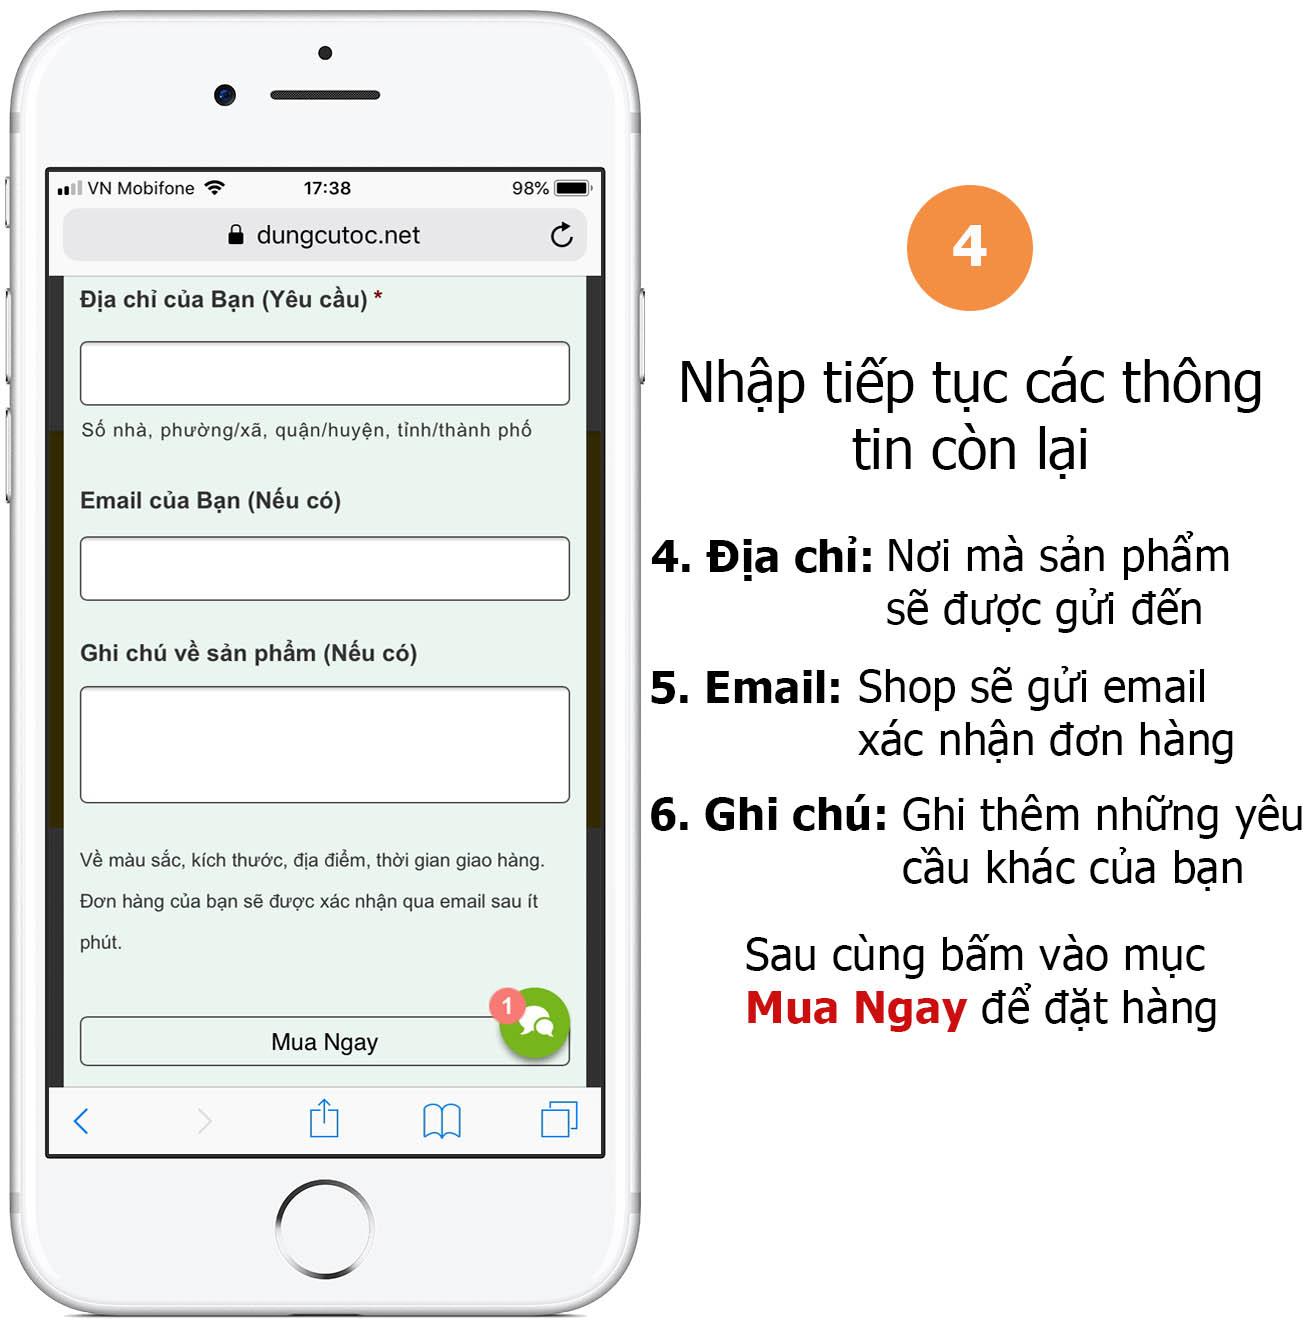 cach-mua-hang-online